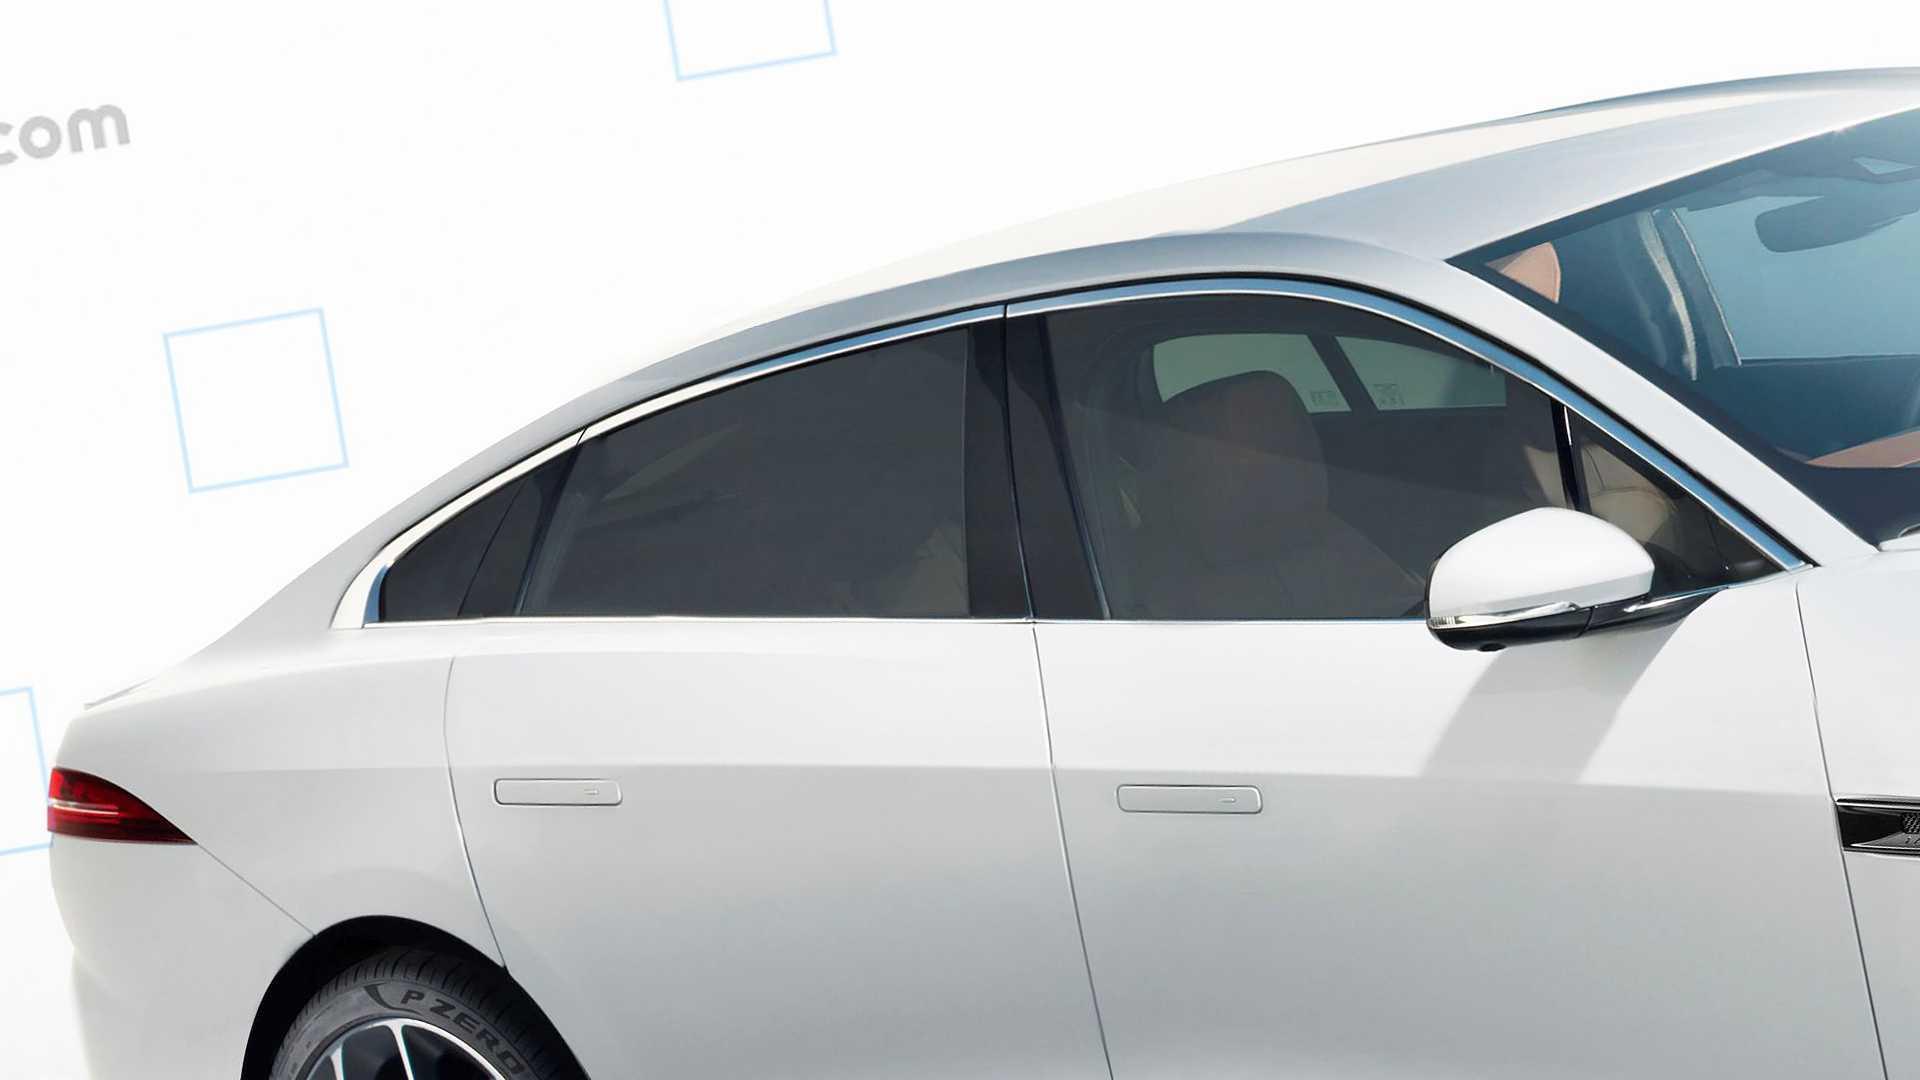 New Jaguar Xj Rendered To Take On The German Luxury Trifecta